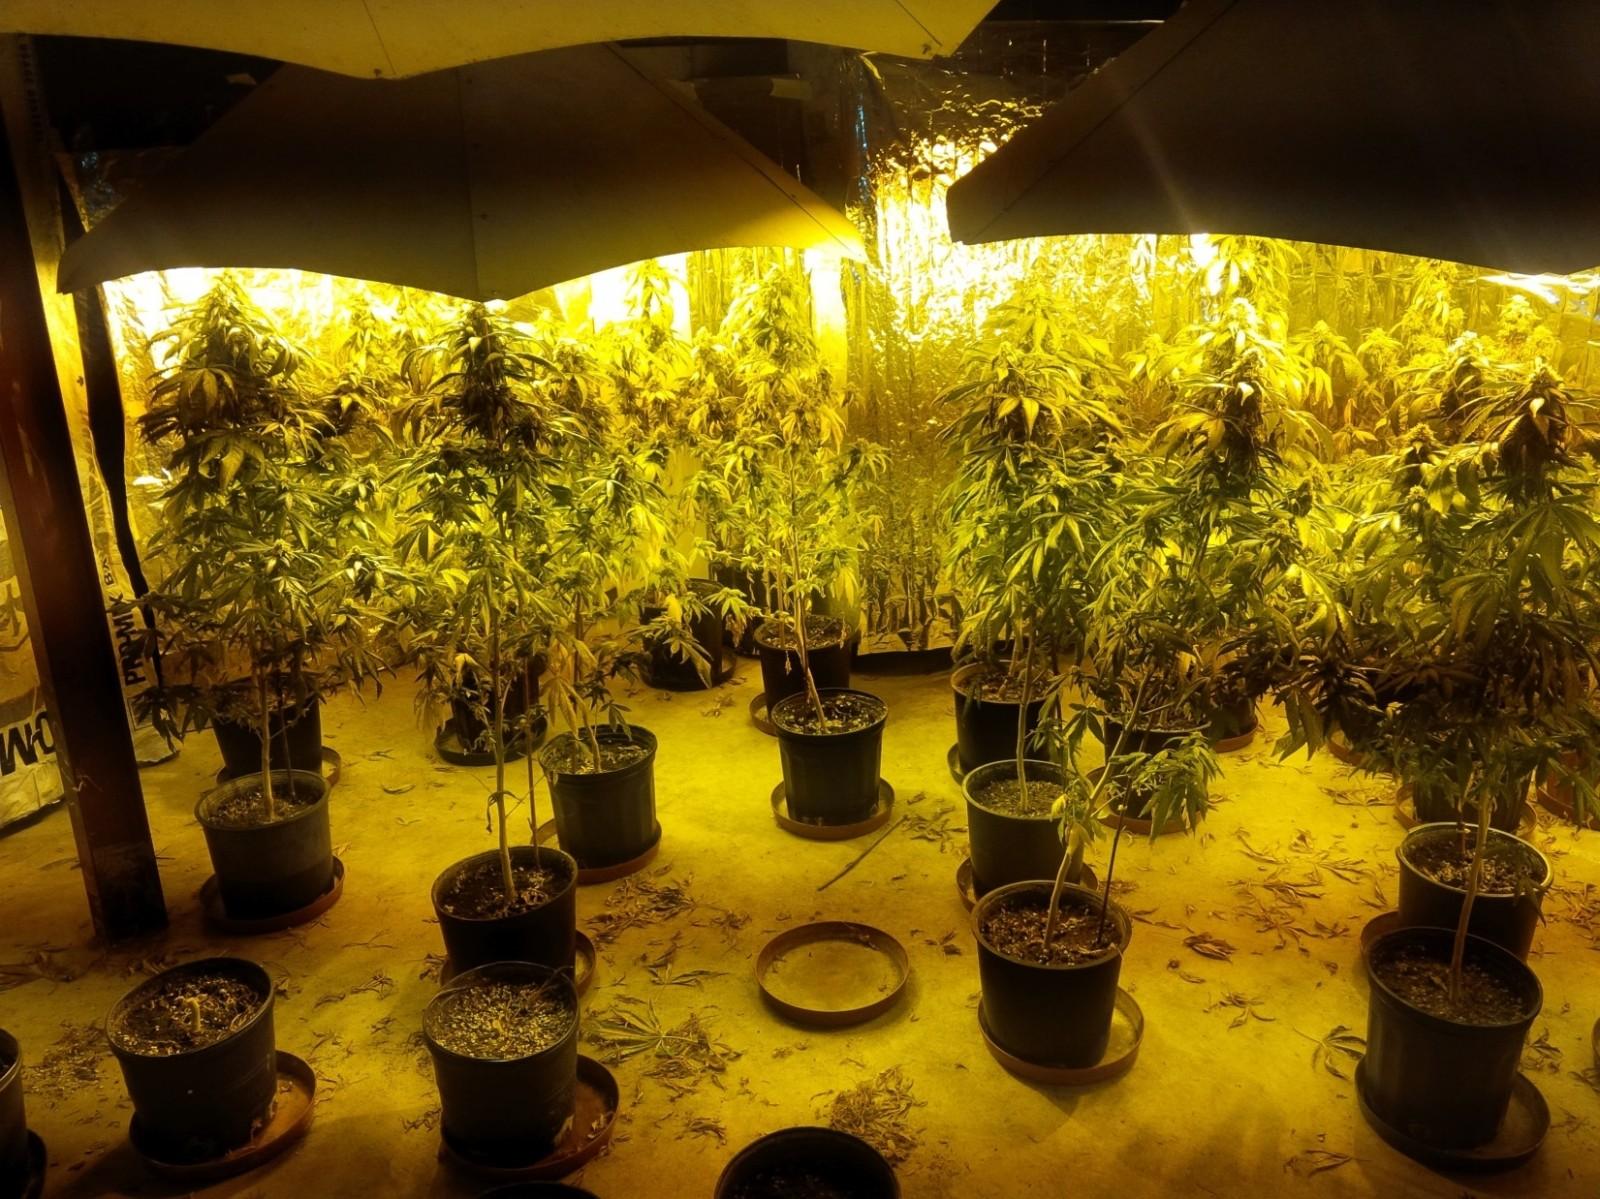 Police seize just under 110 thousand dollars worth of marijuana